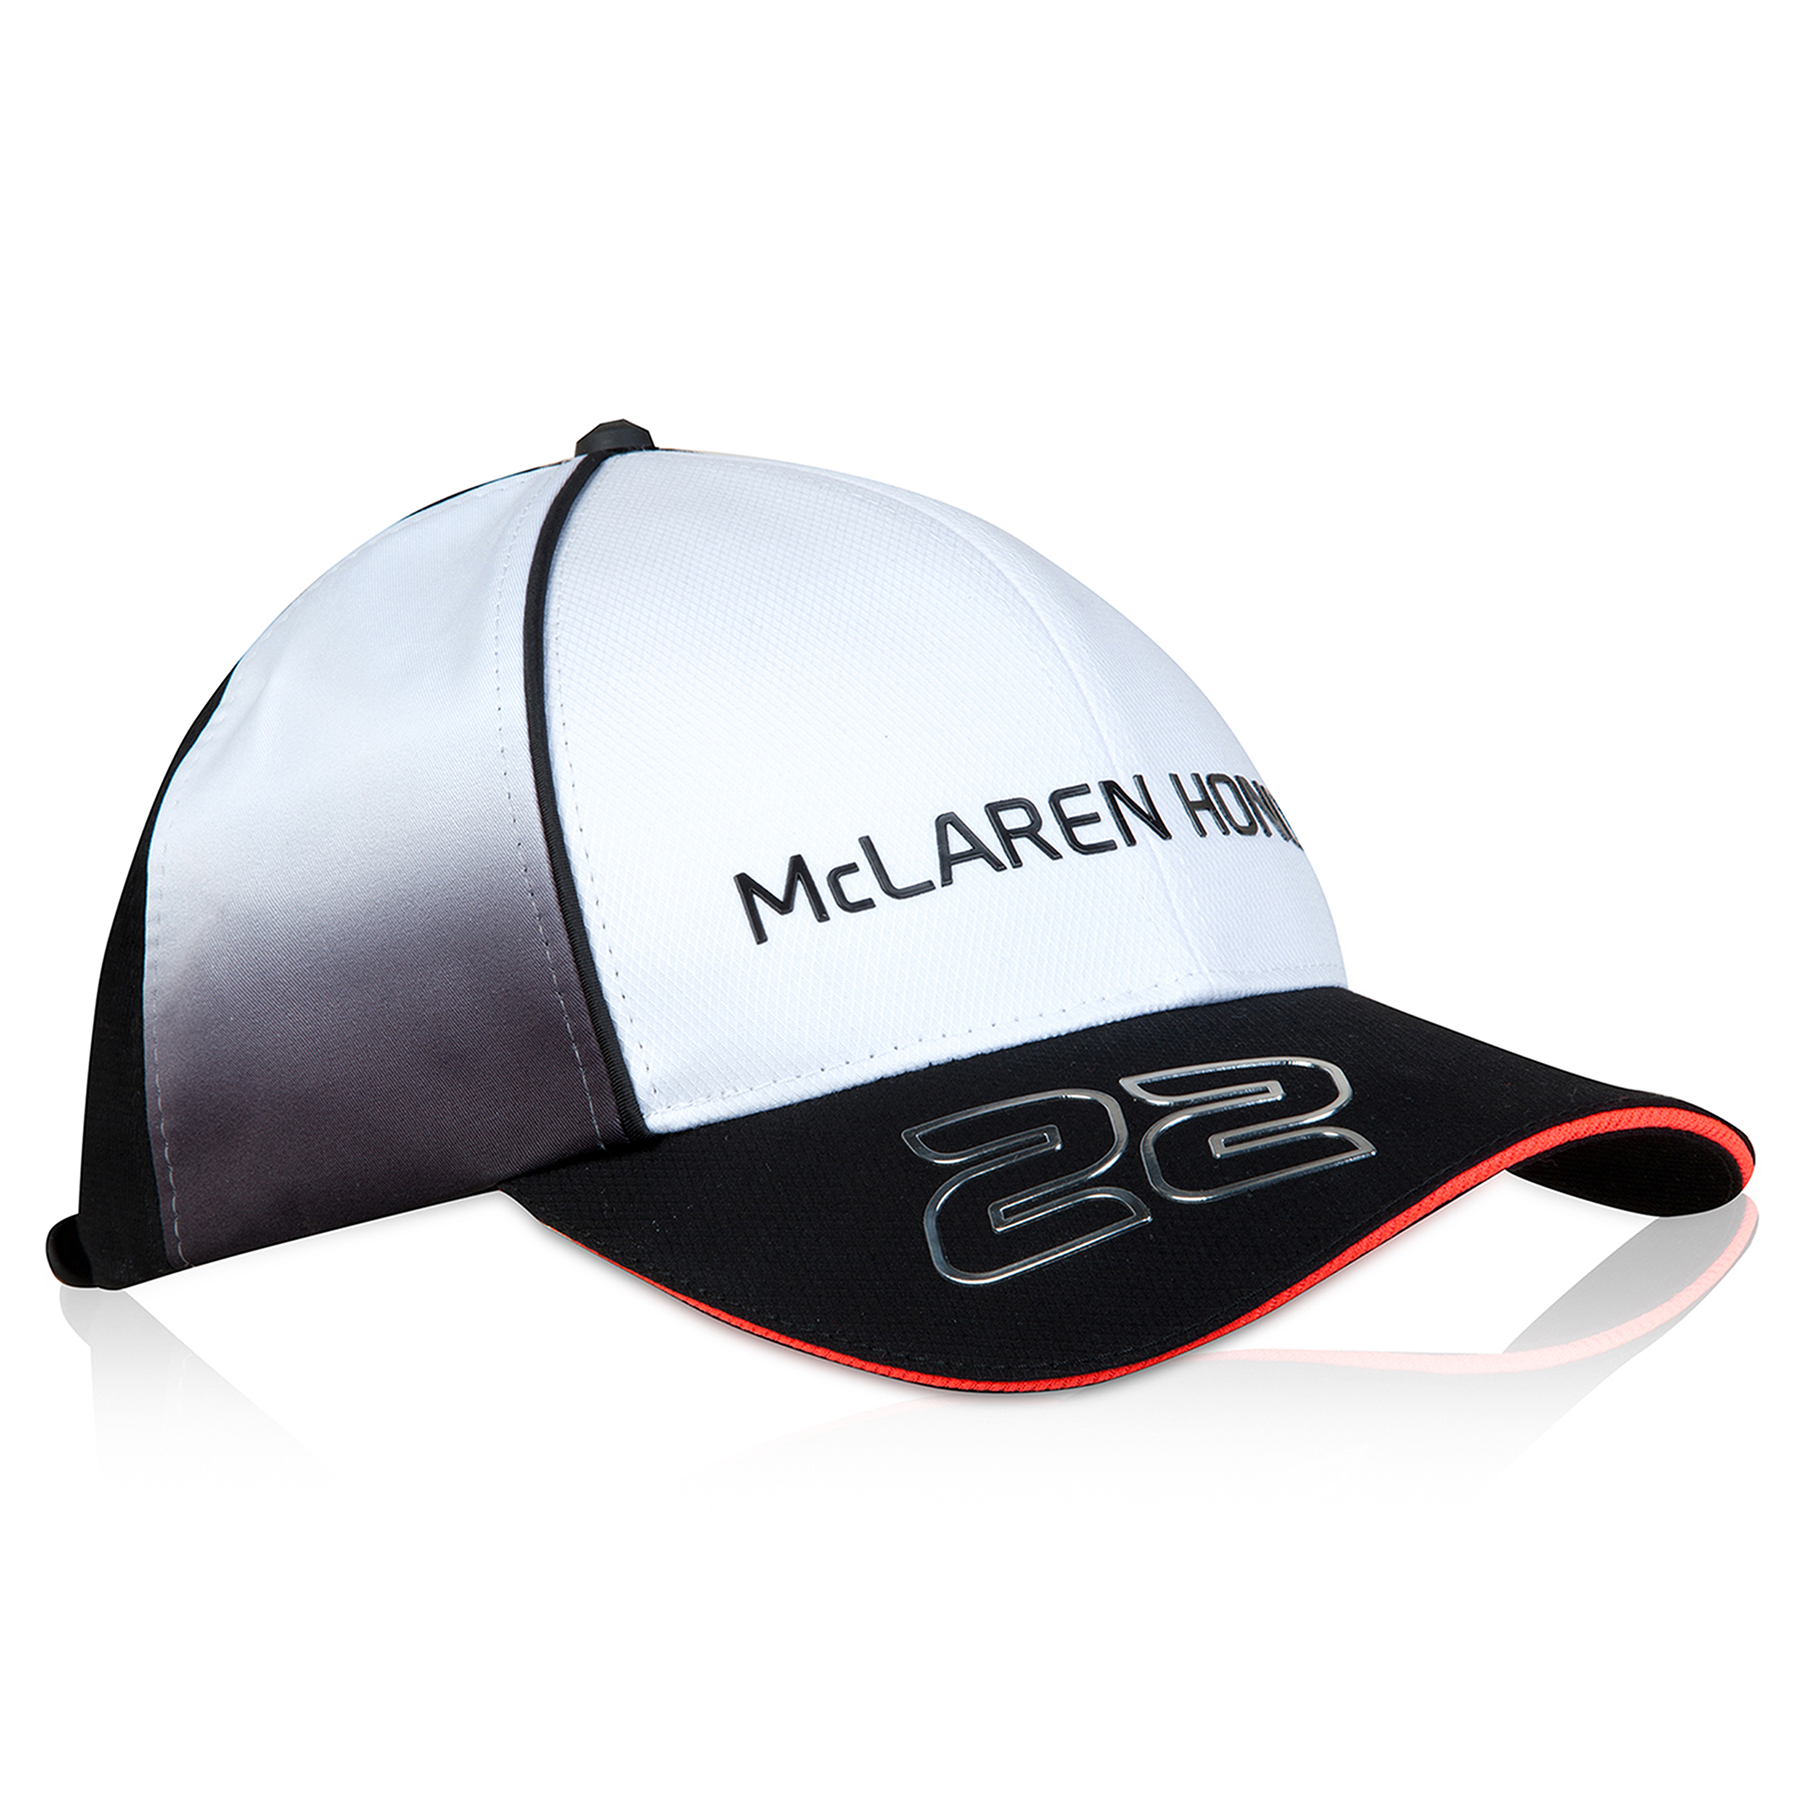 McLaren Honda Official 2016 Jenson Button Cap